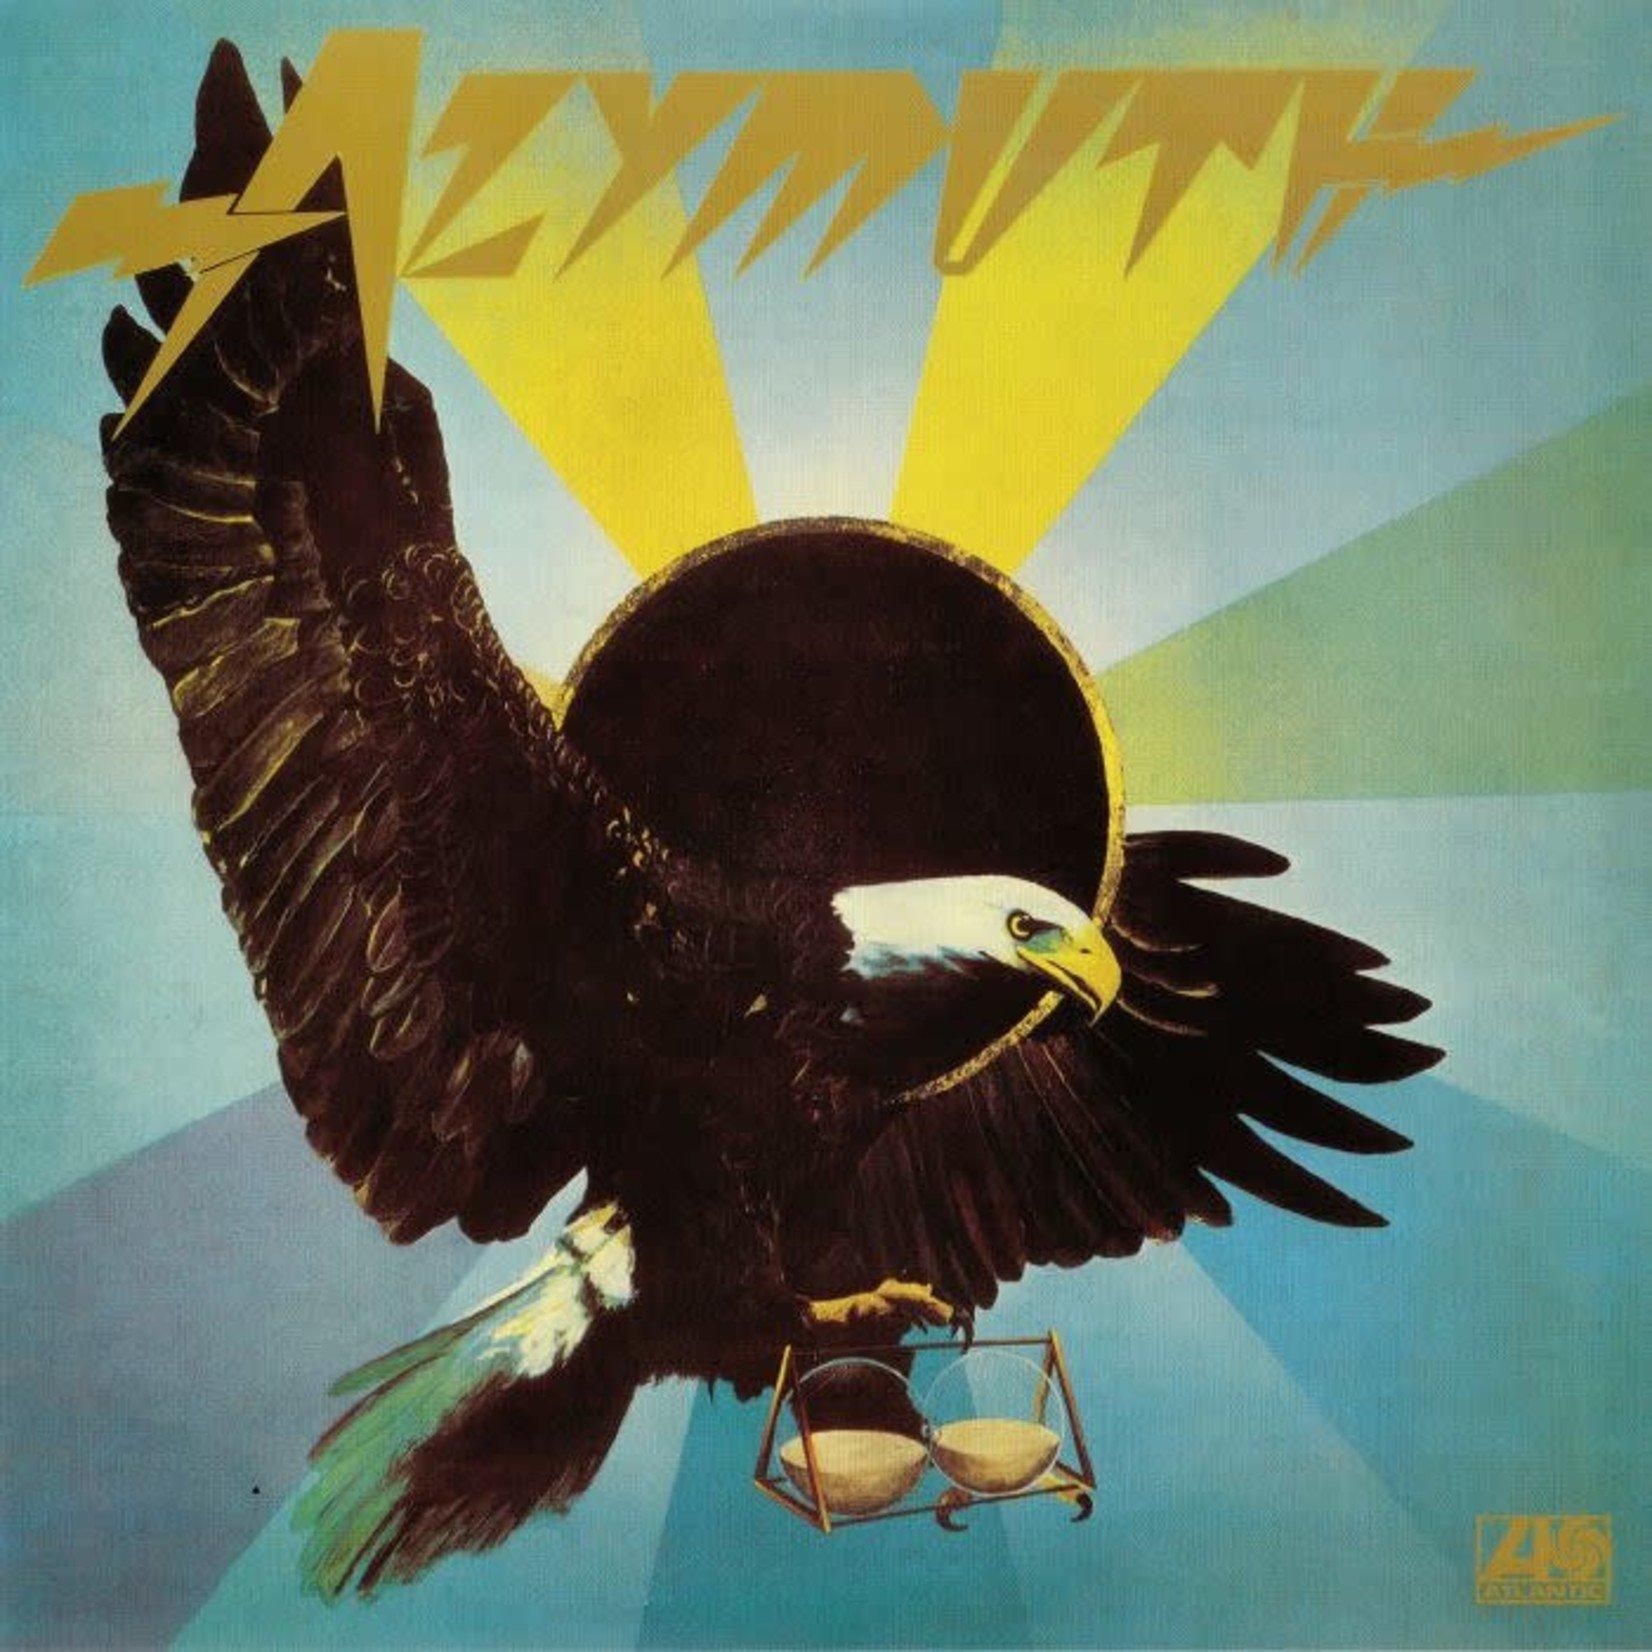 [New] Azymuth: Aguia Nao Come Mosca